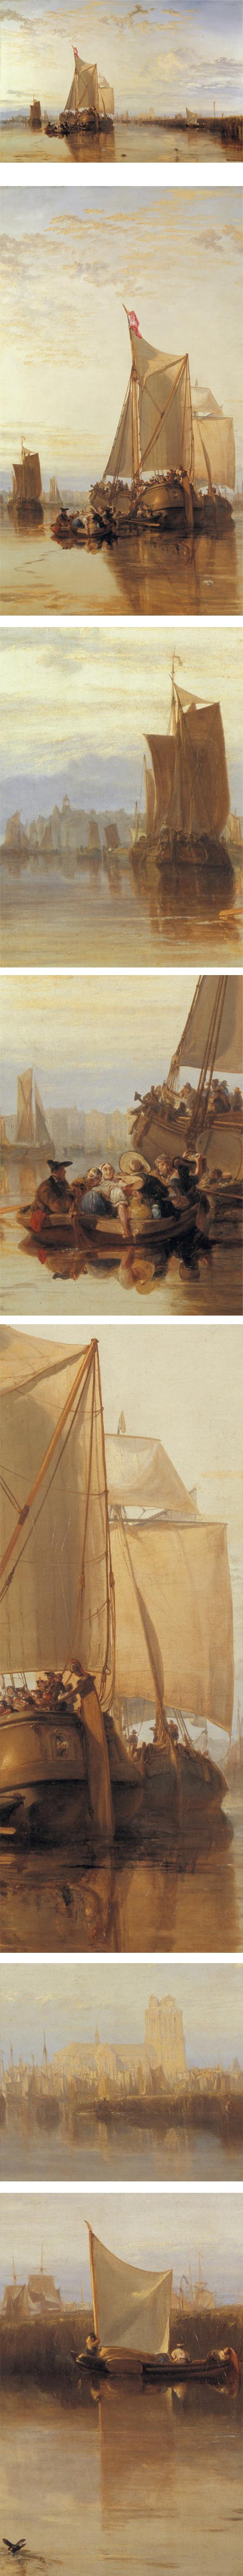 Dortdrecht: The Dort Packet-Boat from Rotterdam Becalmed, J.M.W. Turner